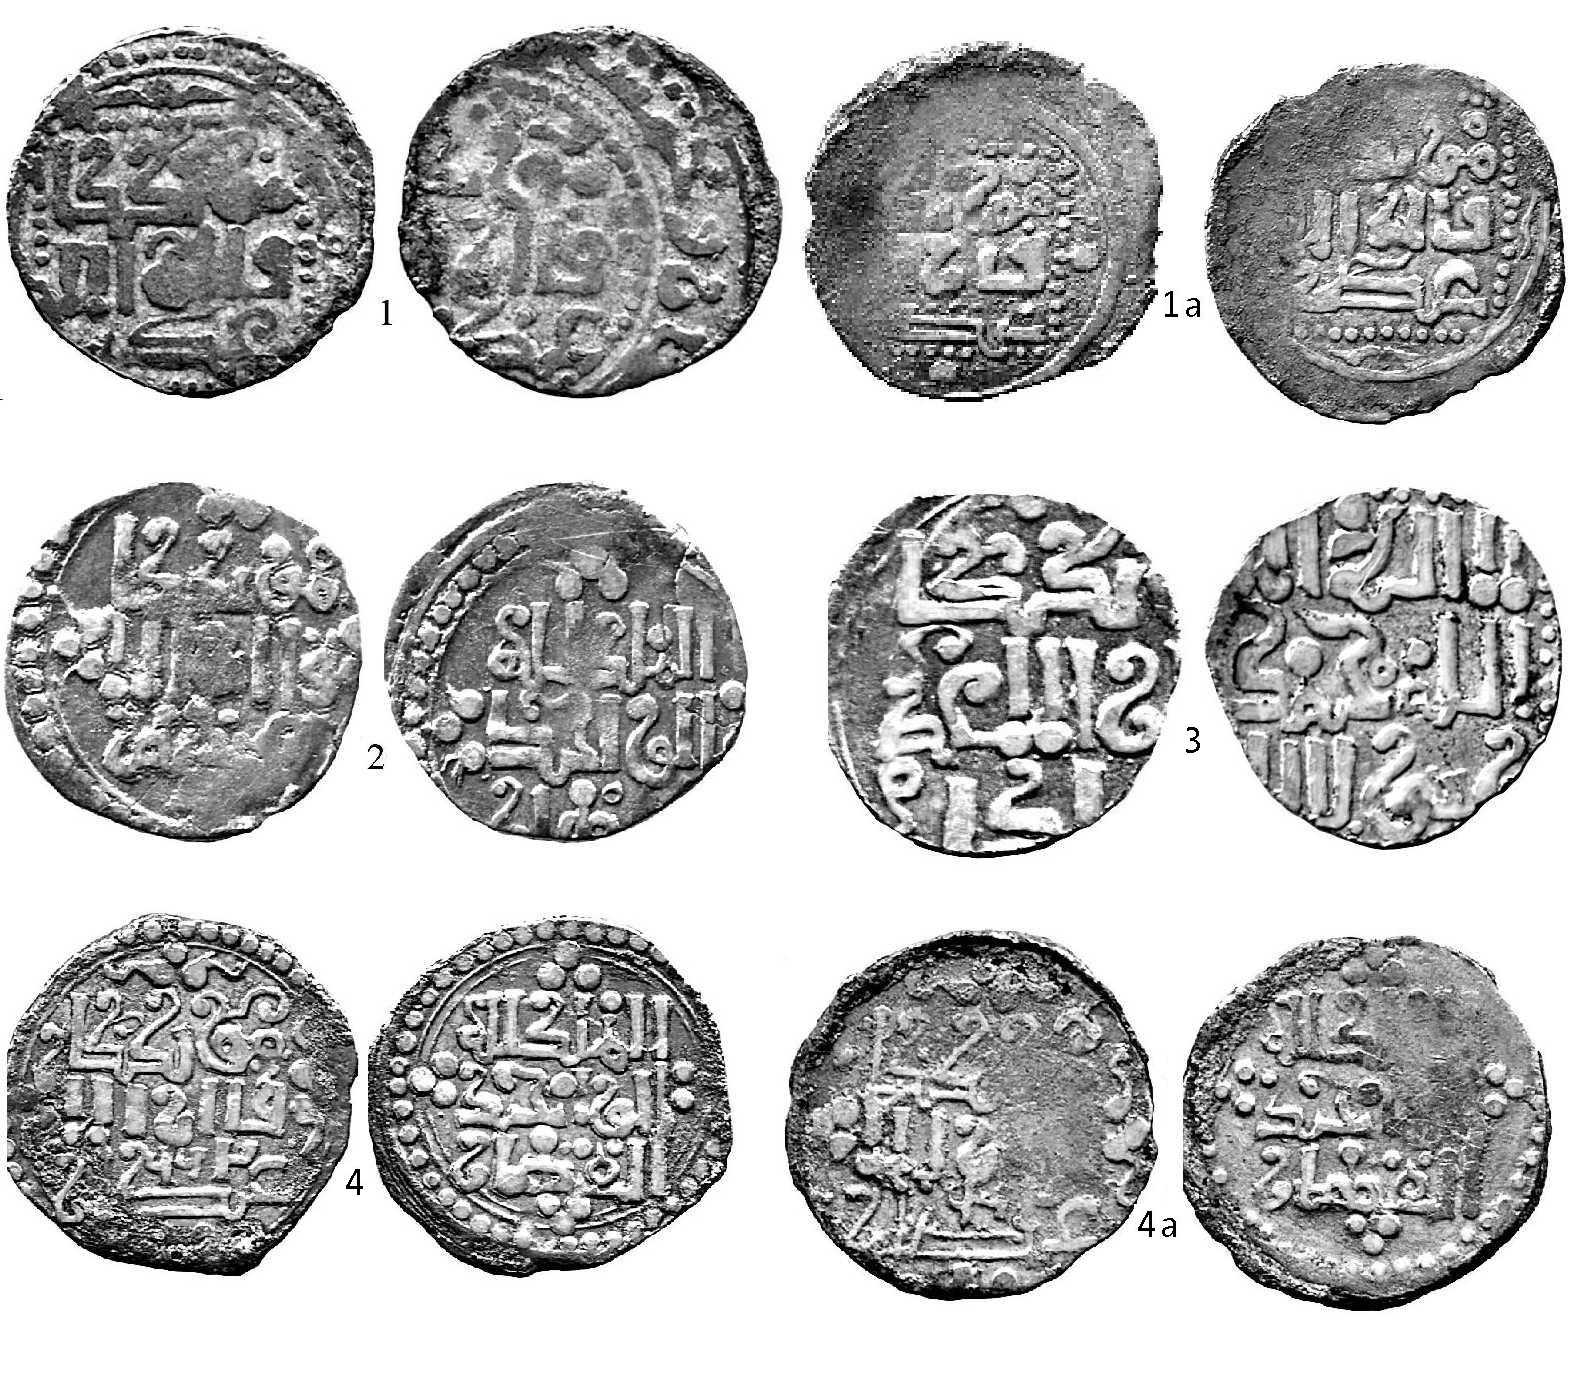 Фото 1. Снимки дирхемов каана Мунгка чекана Хорезма 658-662 гг.х.